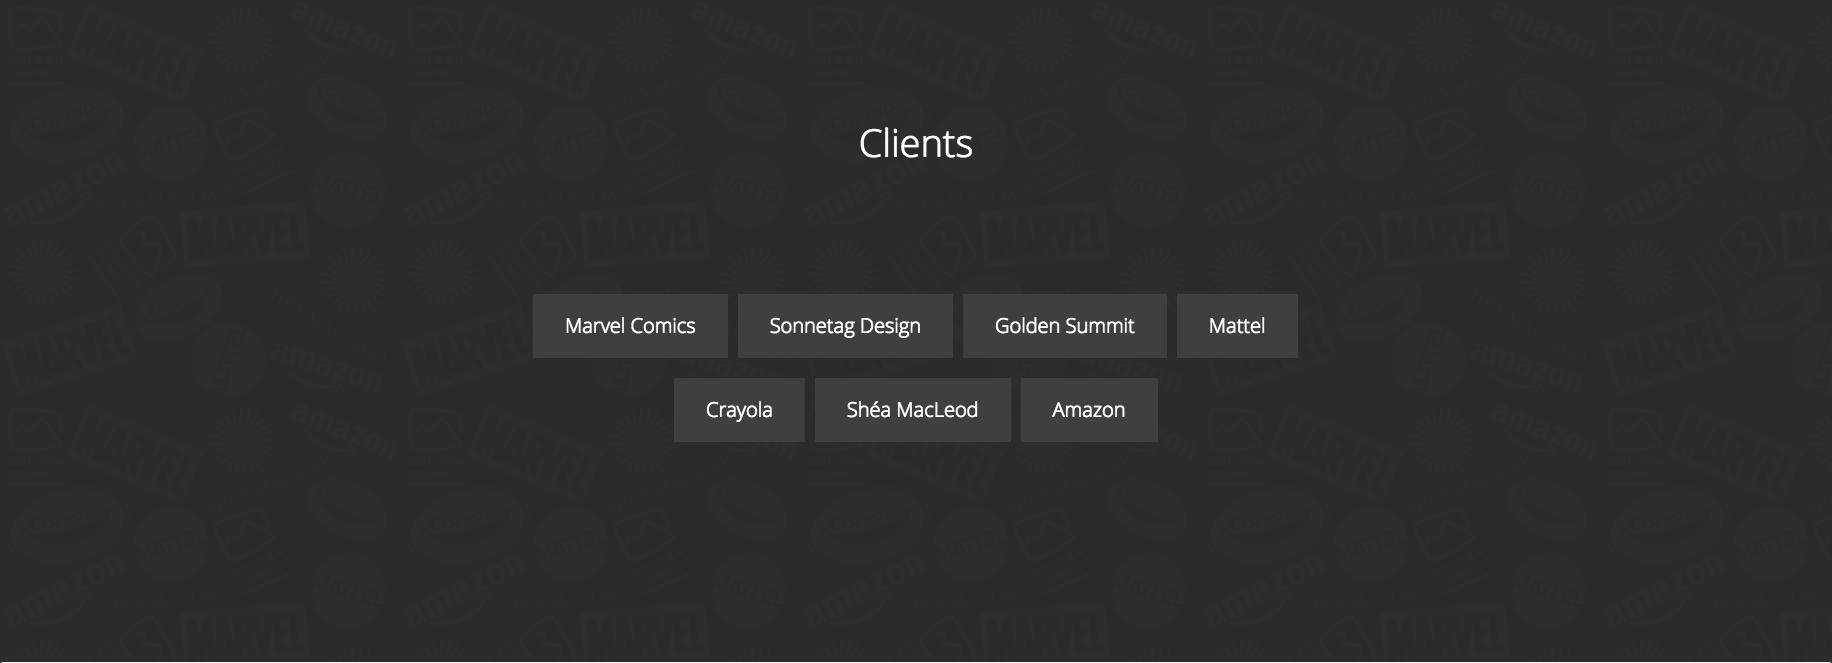 Popskull Productions | Clients